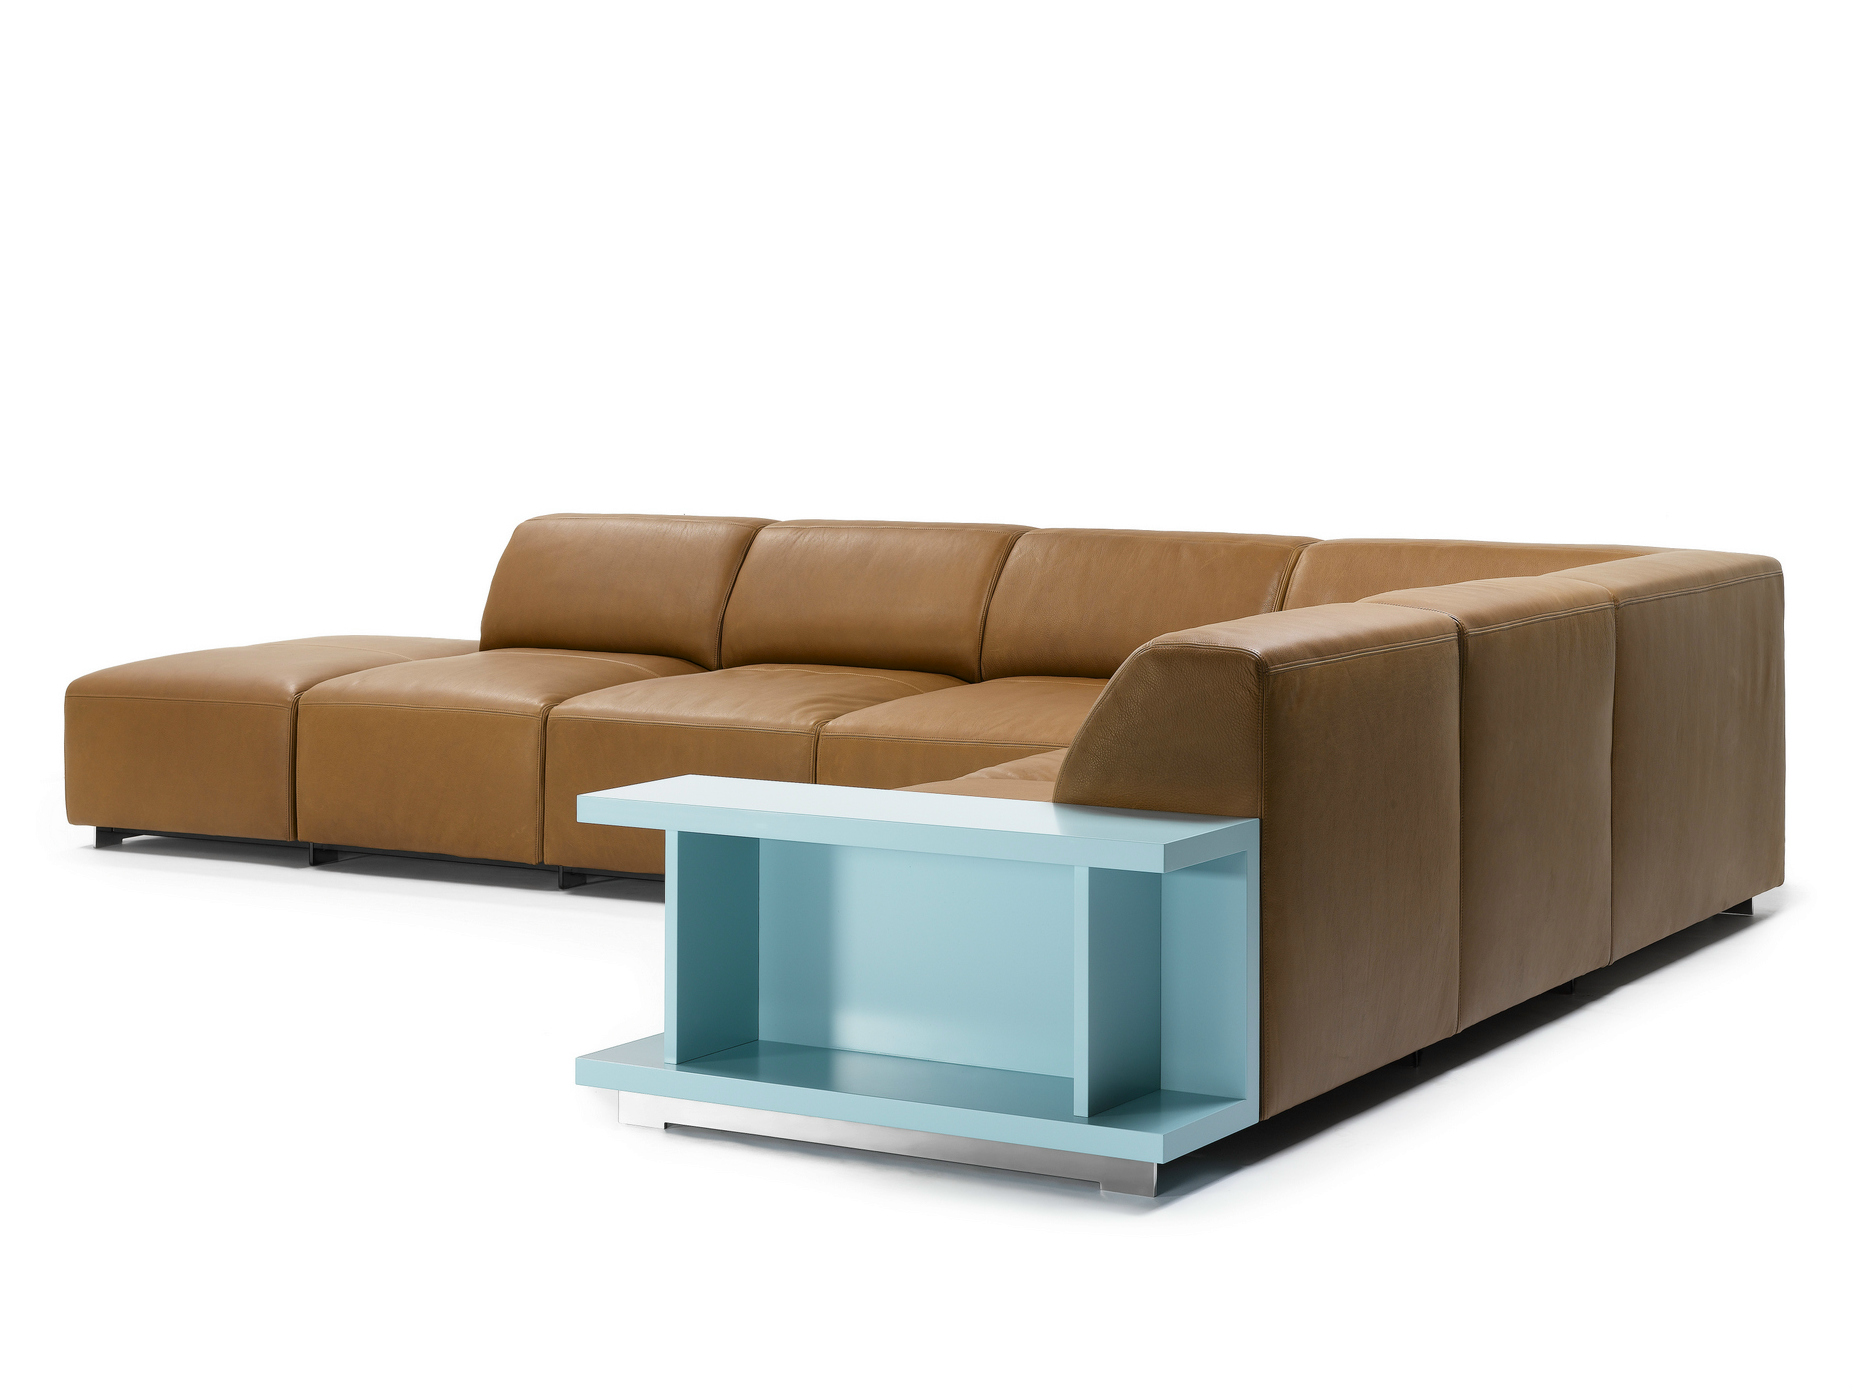 LONG ISLAND Sofa by Kai Stania for Durlet - Sohomod Blog